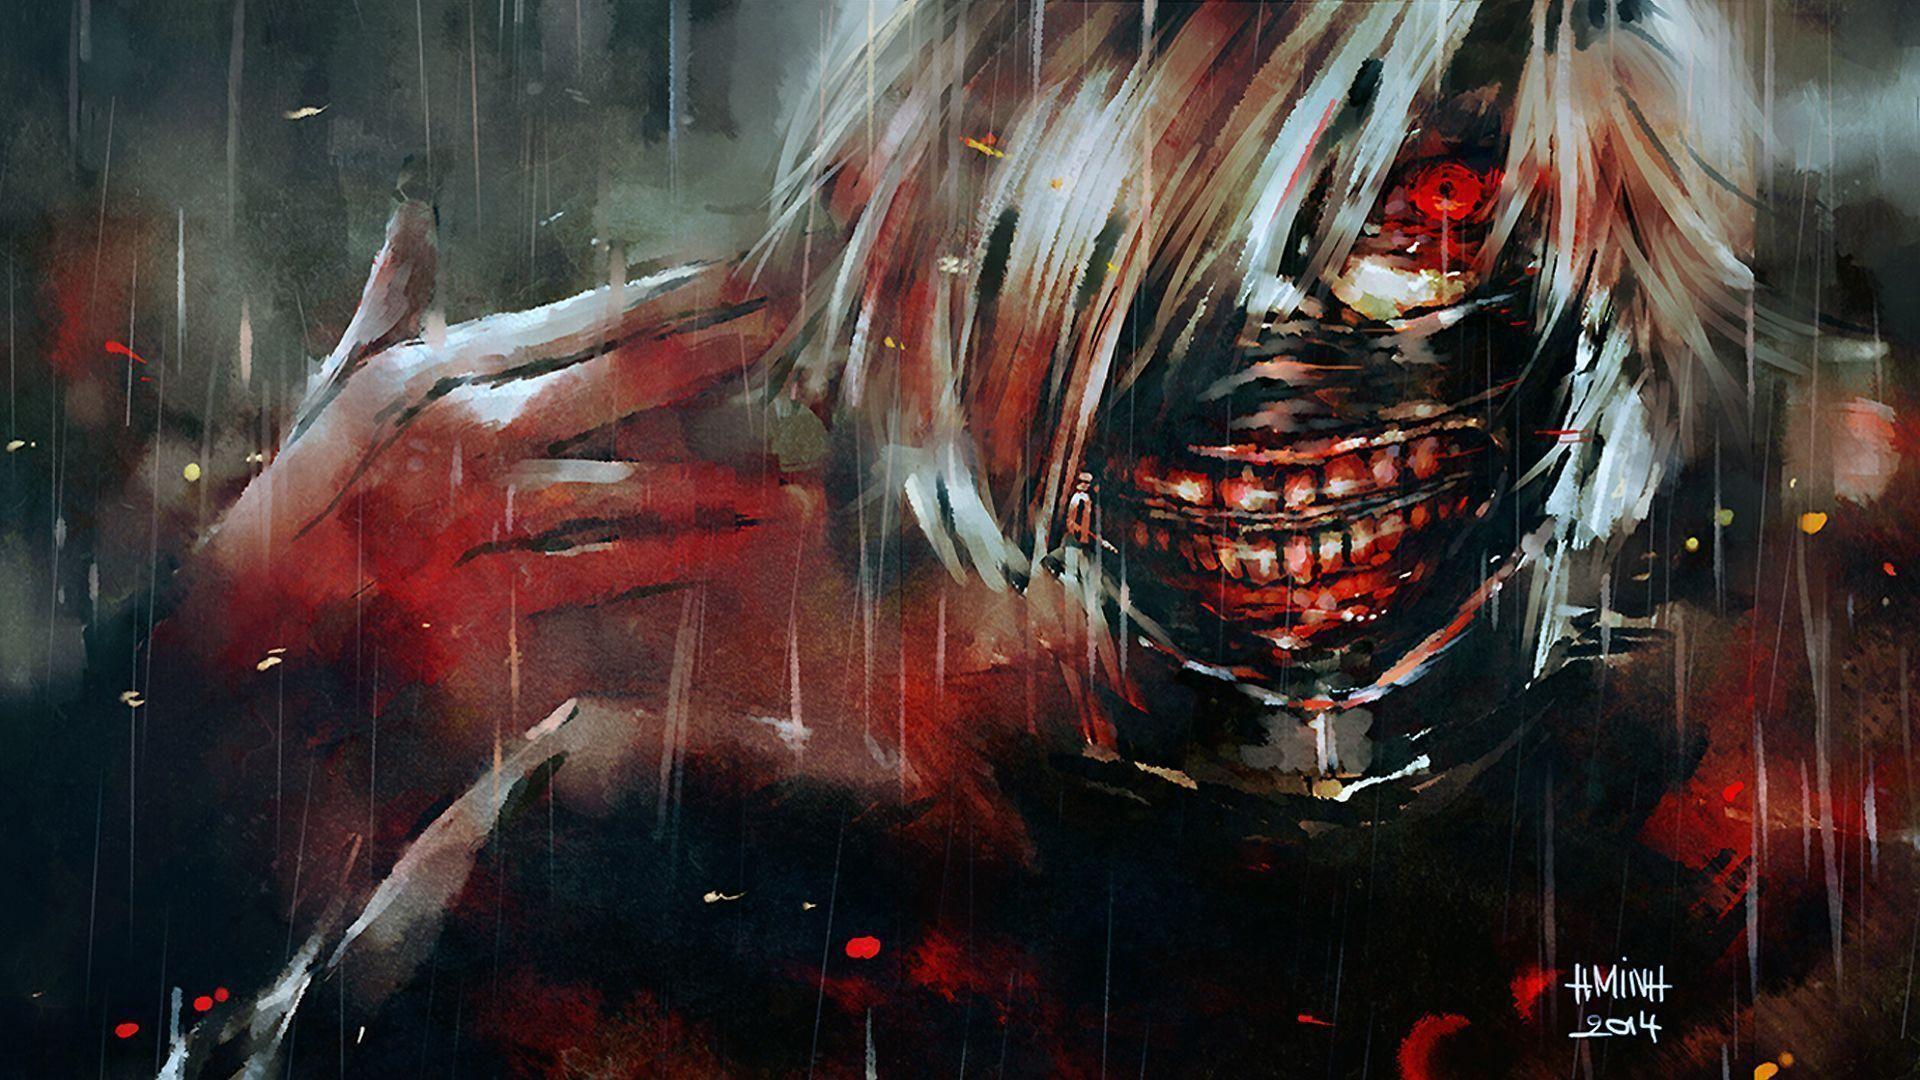 Uta Tokyo Ghoul HD Wallpapers Backgrounds Wallpaper